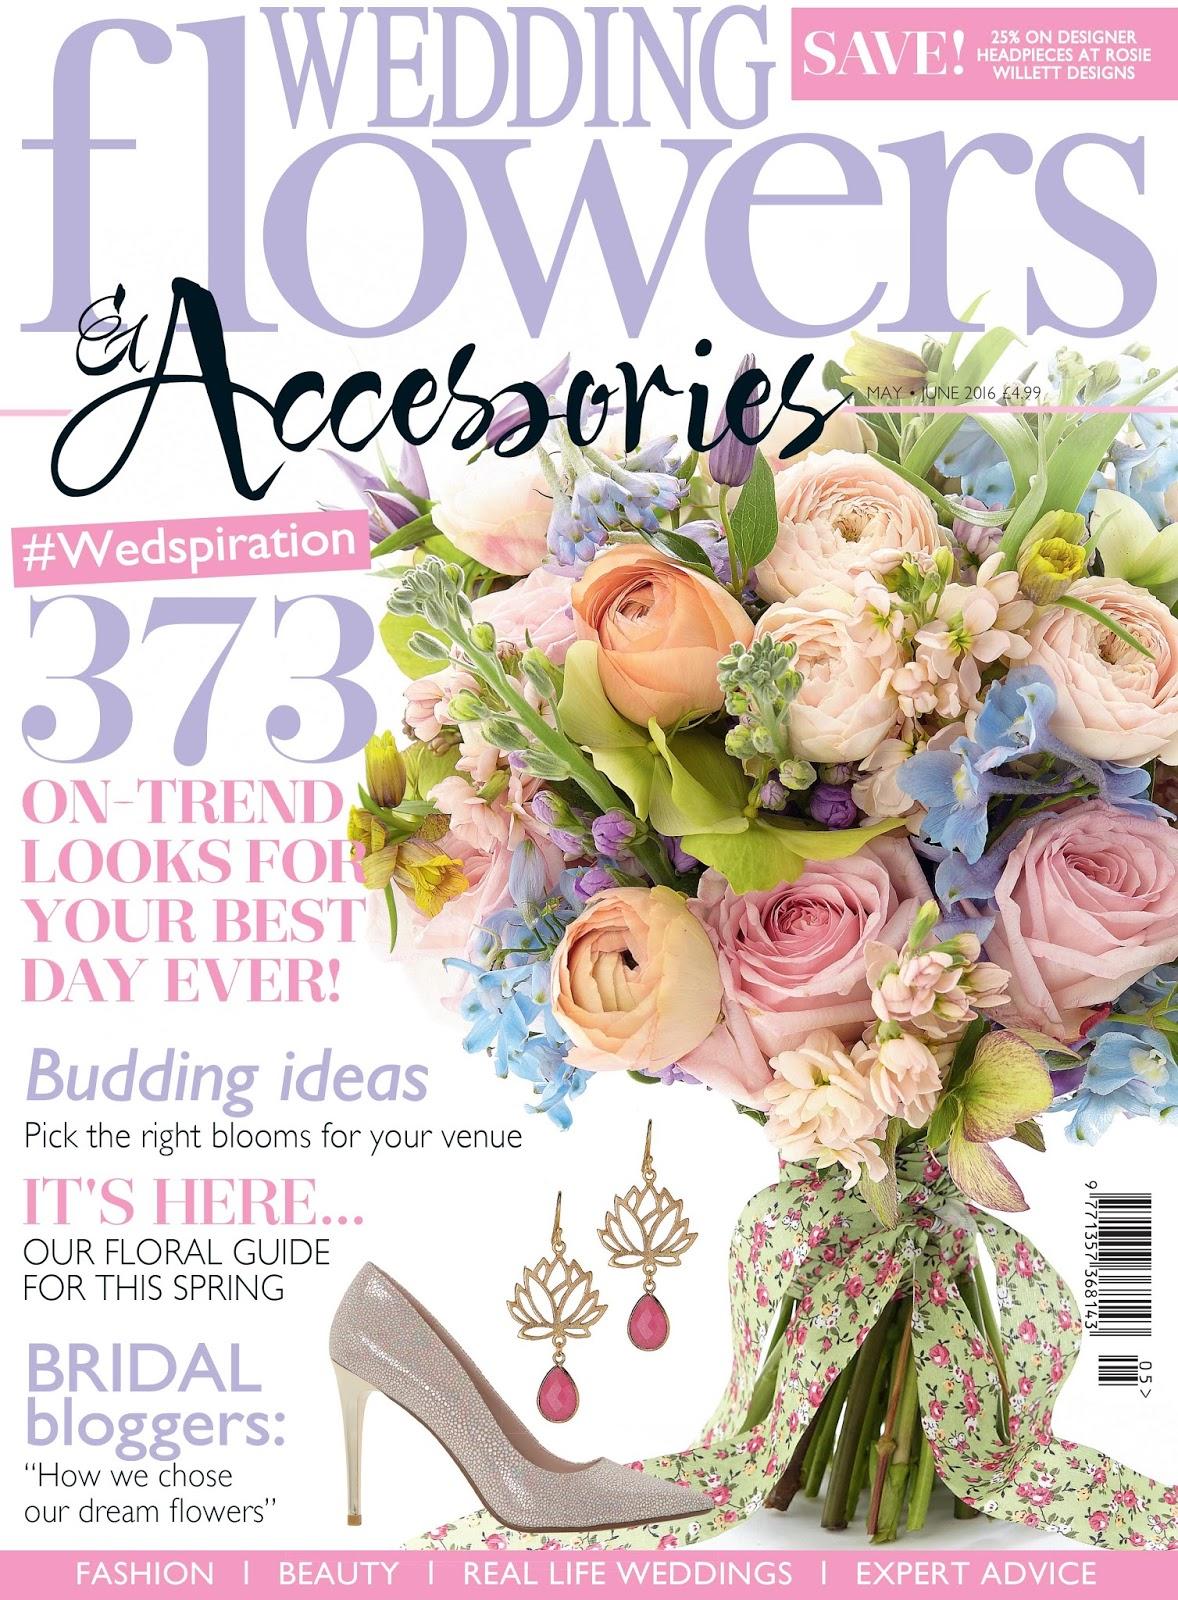 Wedding Flowers Accessories Names Editor Pr Songbird